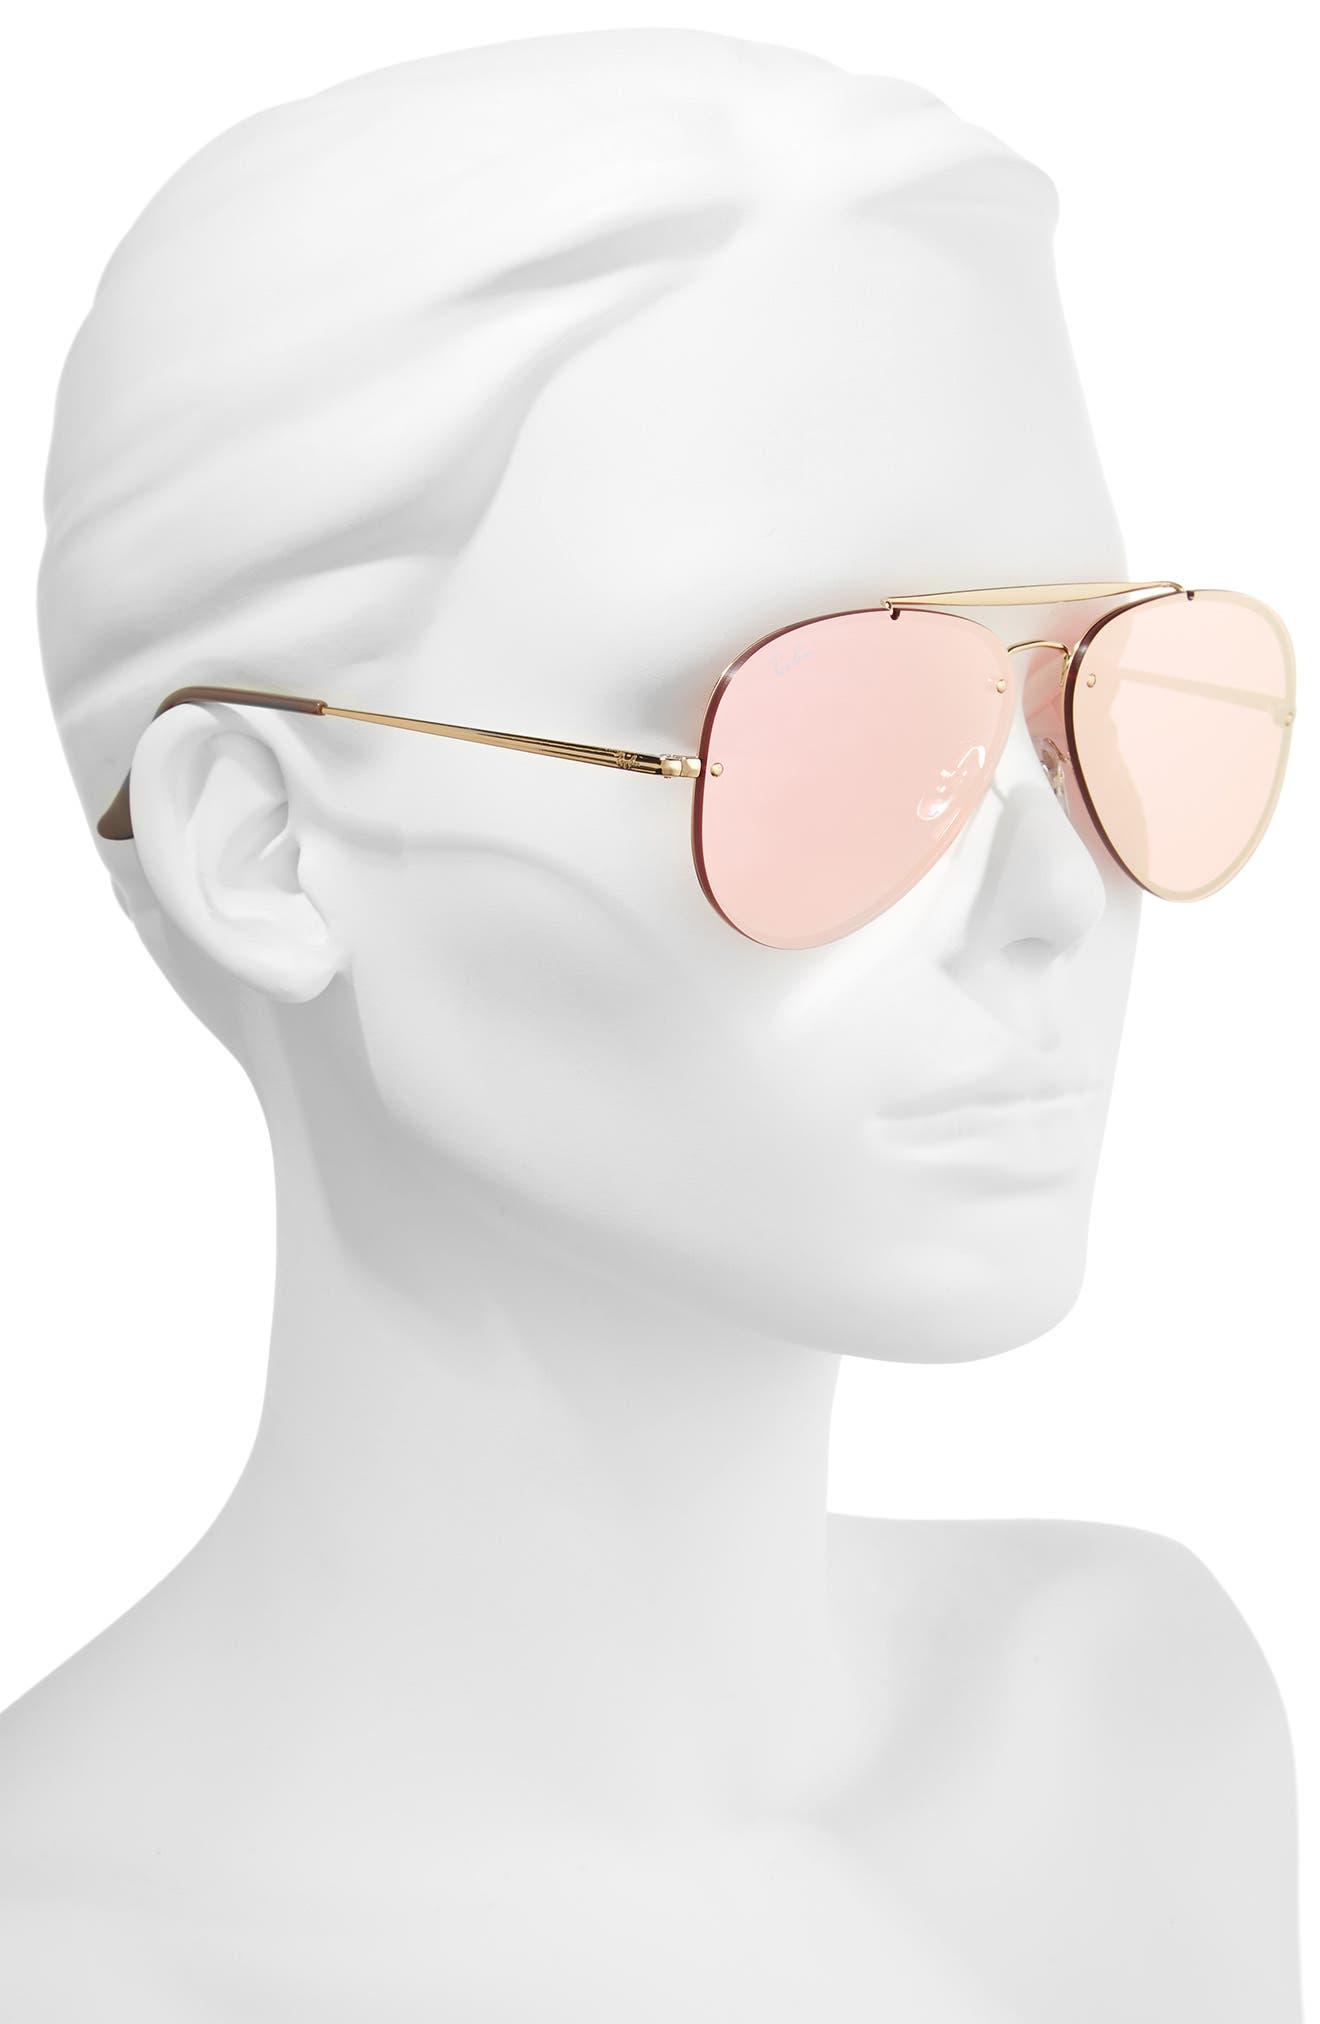 61mm Mirrored Lens Aviator Sunglasses,                             Alternate thumbnail 2, color,                             Gold Pink